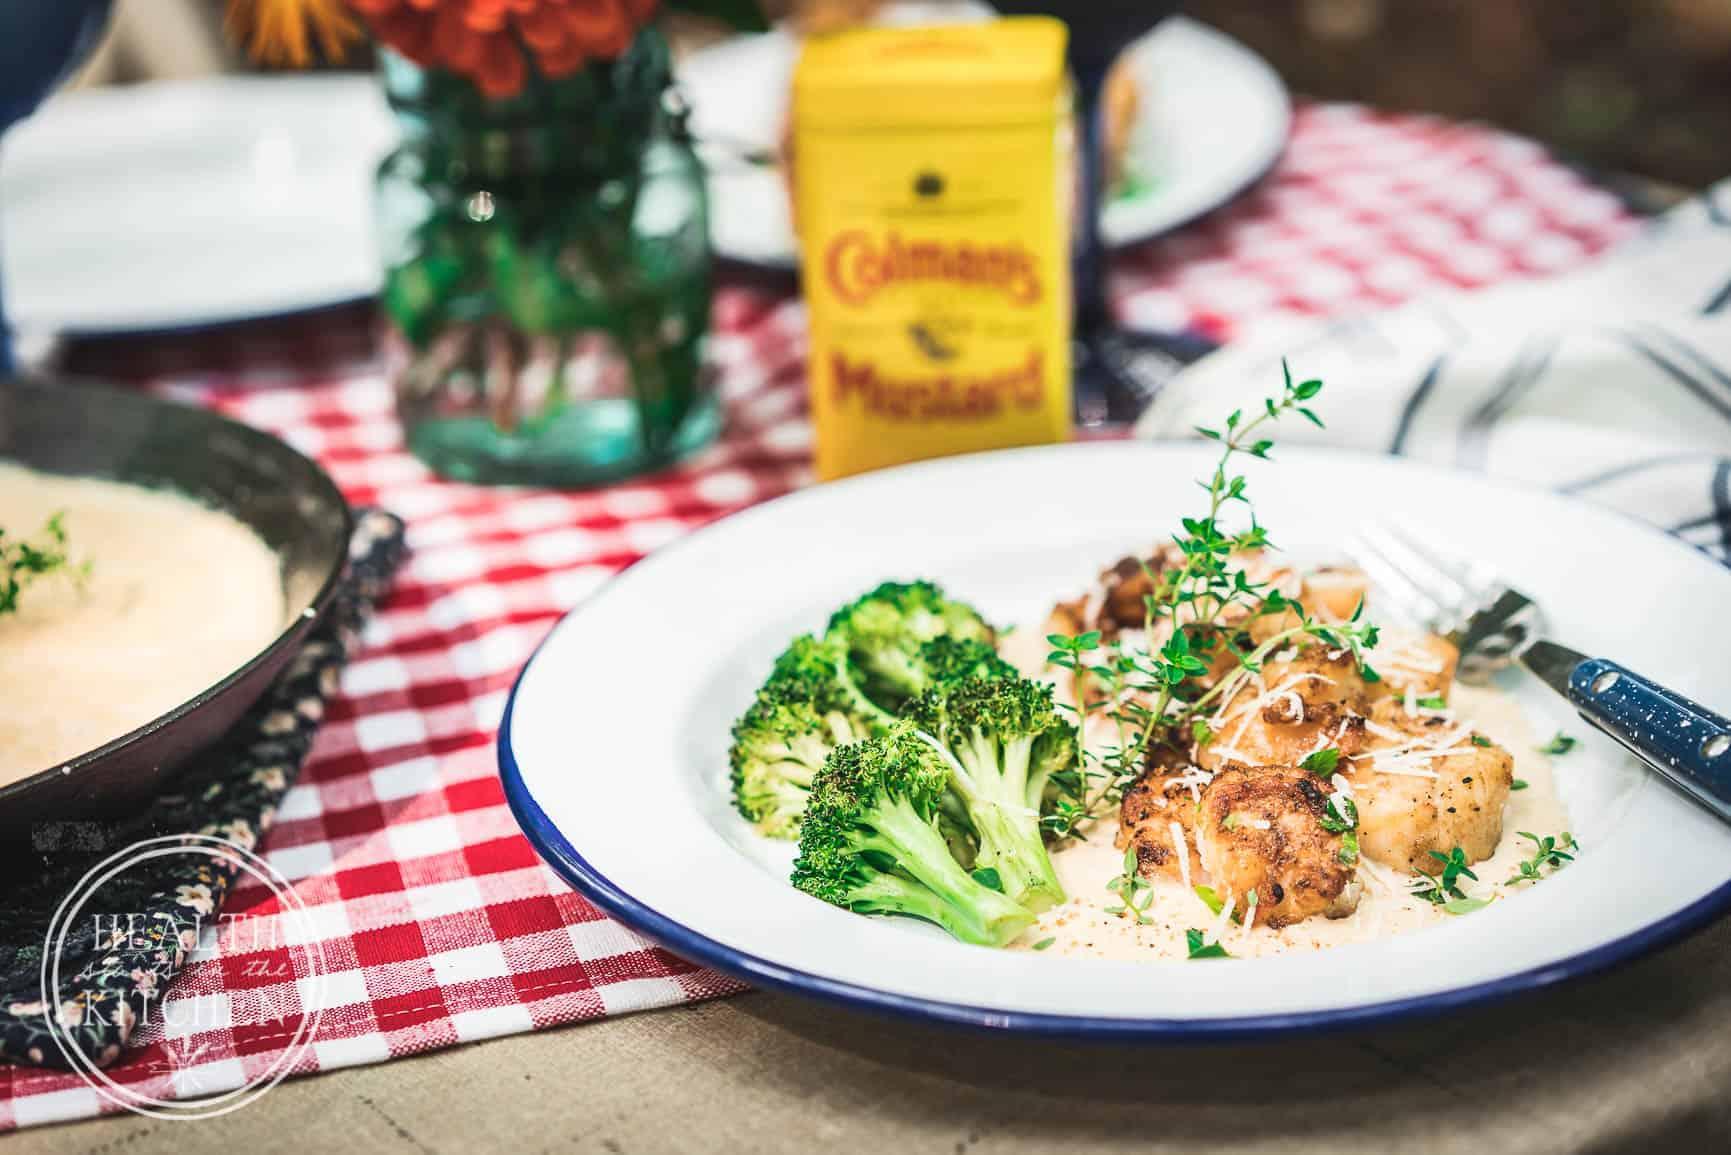 Campfire Grilled Shrimp and Scallops with Magic Creamy Cajun Mustard Sauce